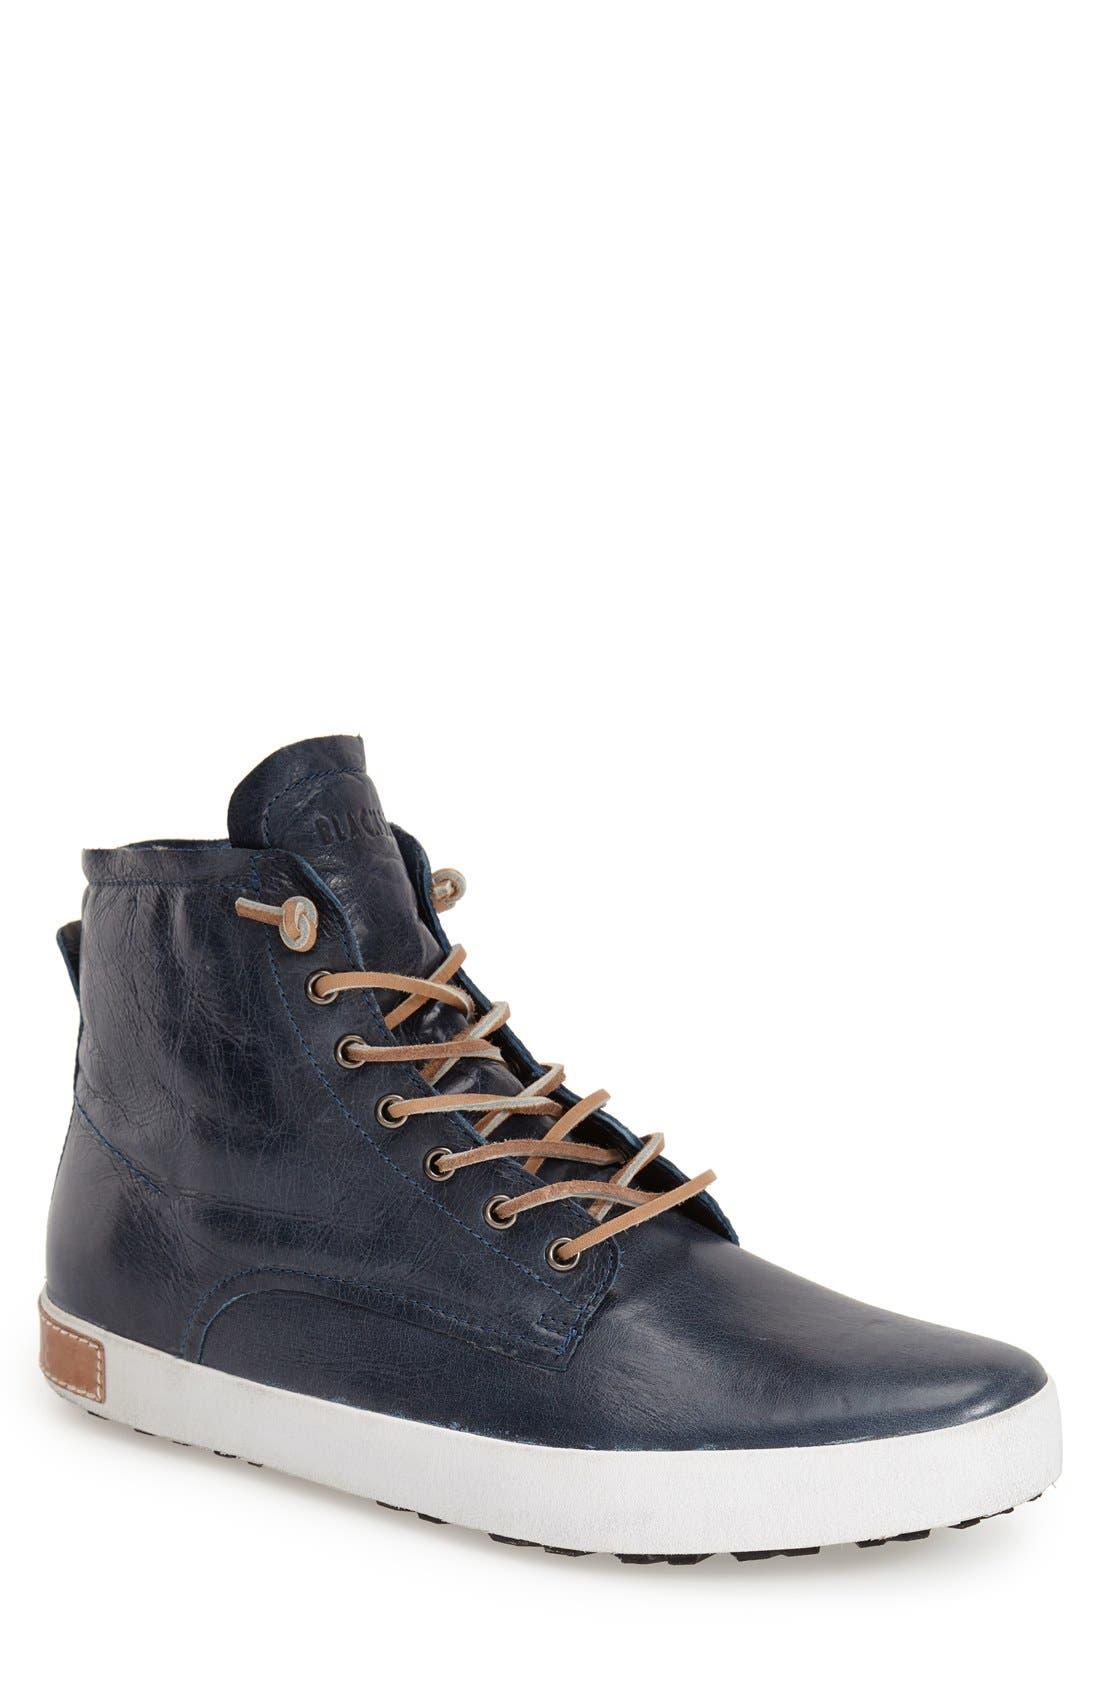 BLACKSTONE 'IM 10' Leather High Top Sneaker